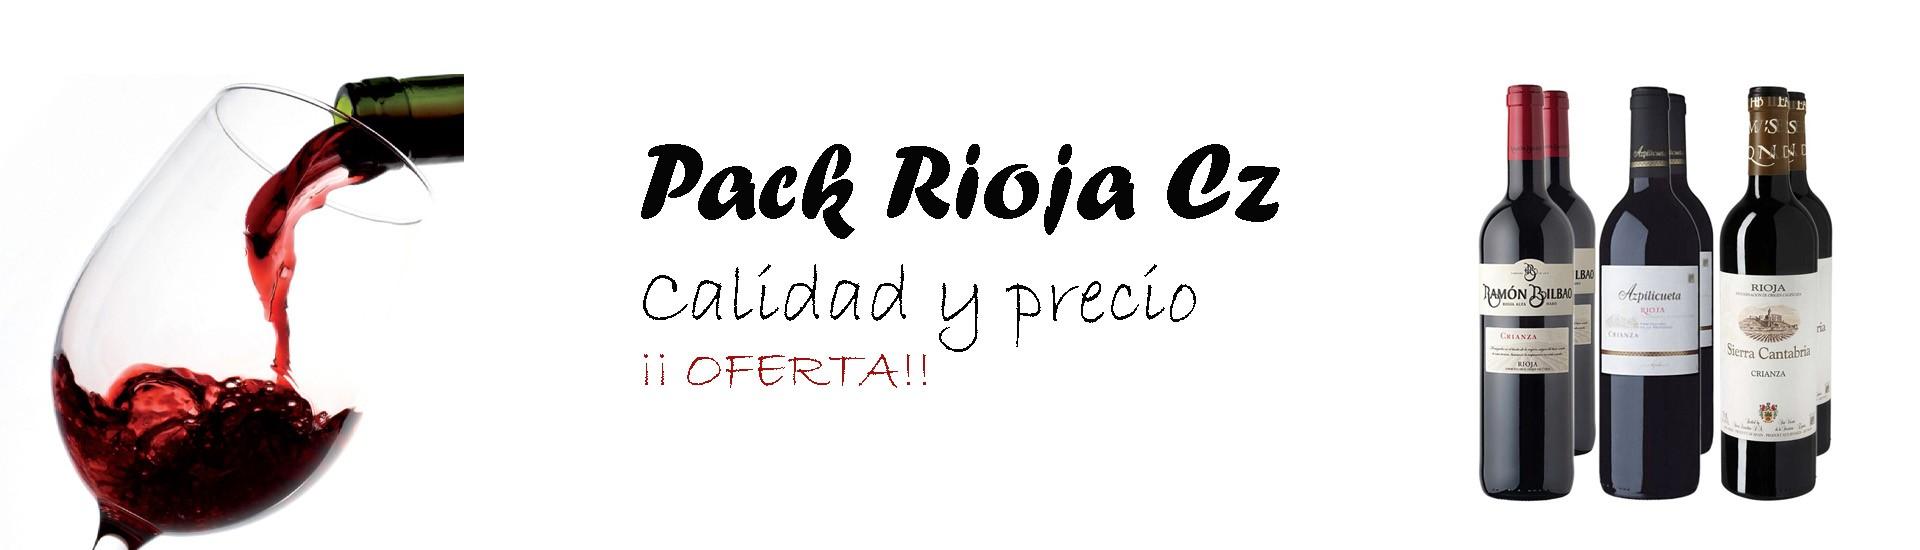 Pack Rioja crianza